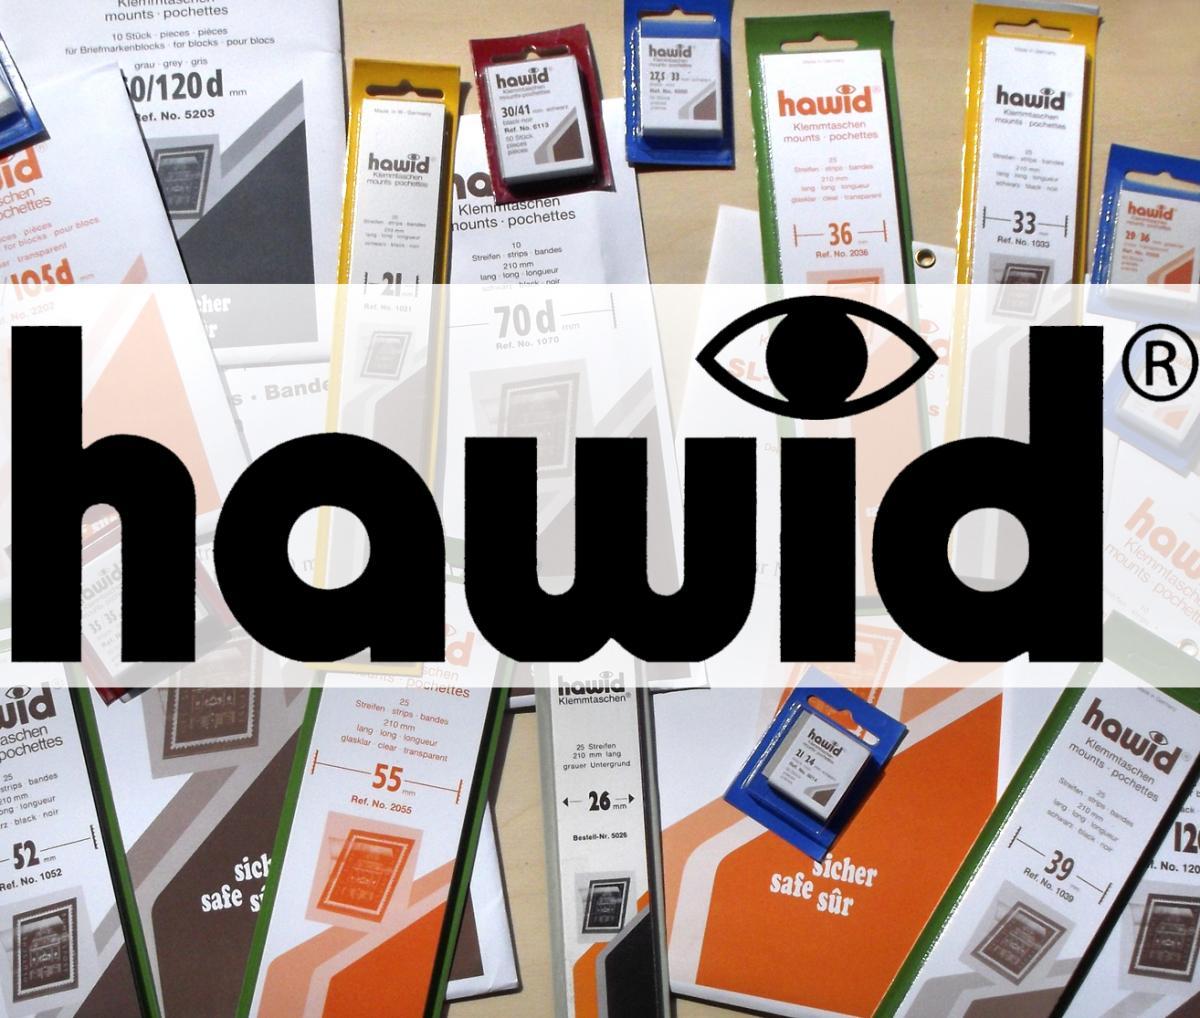 HAWID-Sonderblocks 2305, 74x105 mm, glasklar, 10 Stück 0